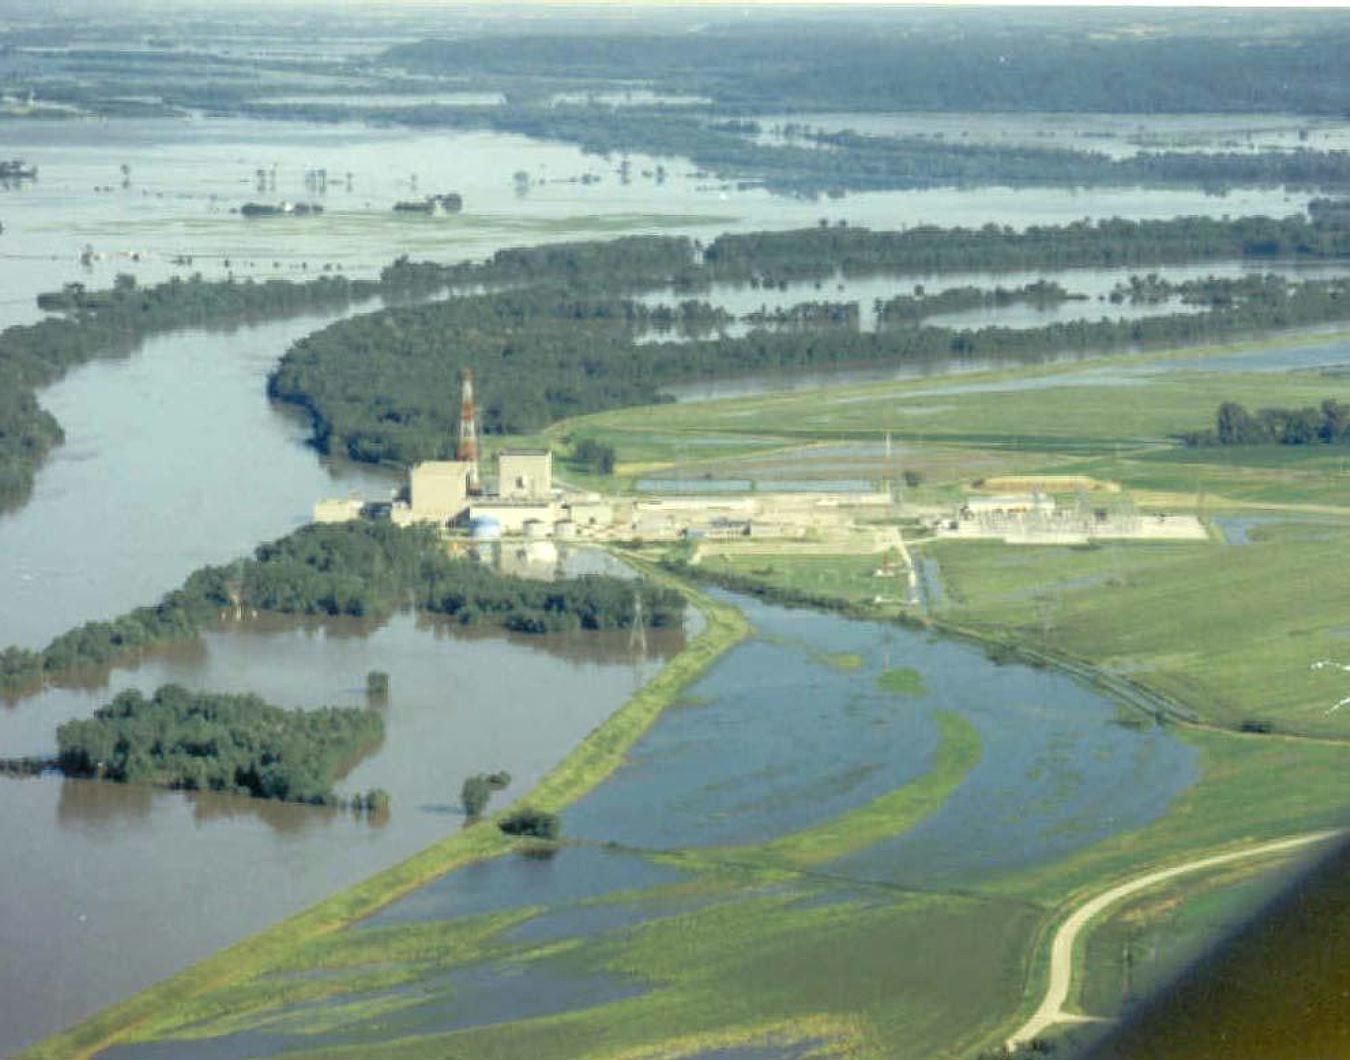 Nebraska Nuclear Power Plants Missouri River Flood Conditions